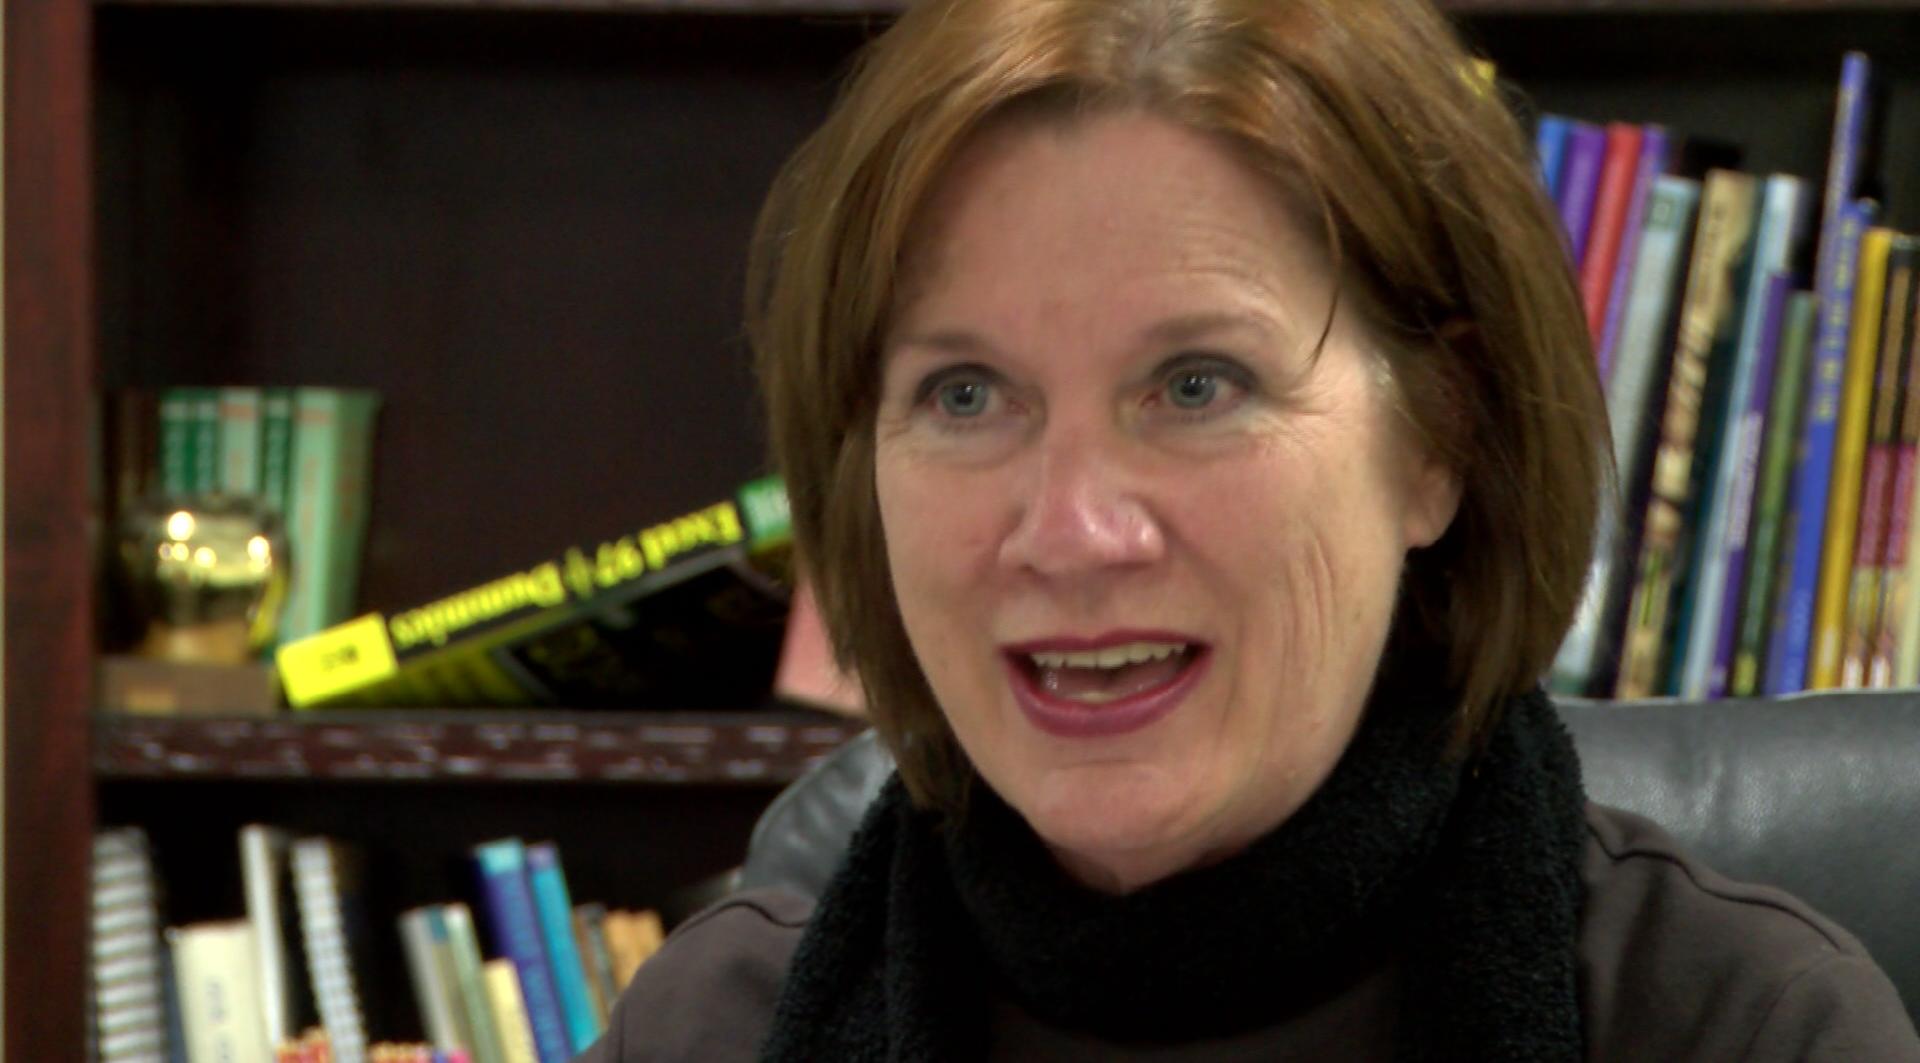 Deena Burnett, a representative of United Teachers of Wichita, spoke to KSN about SB 70.